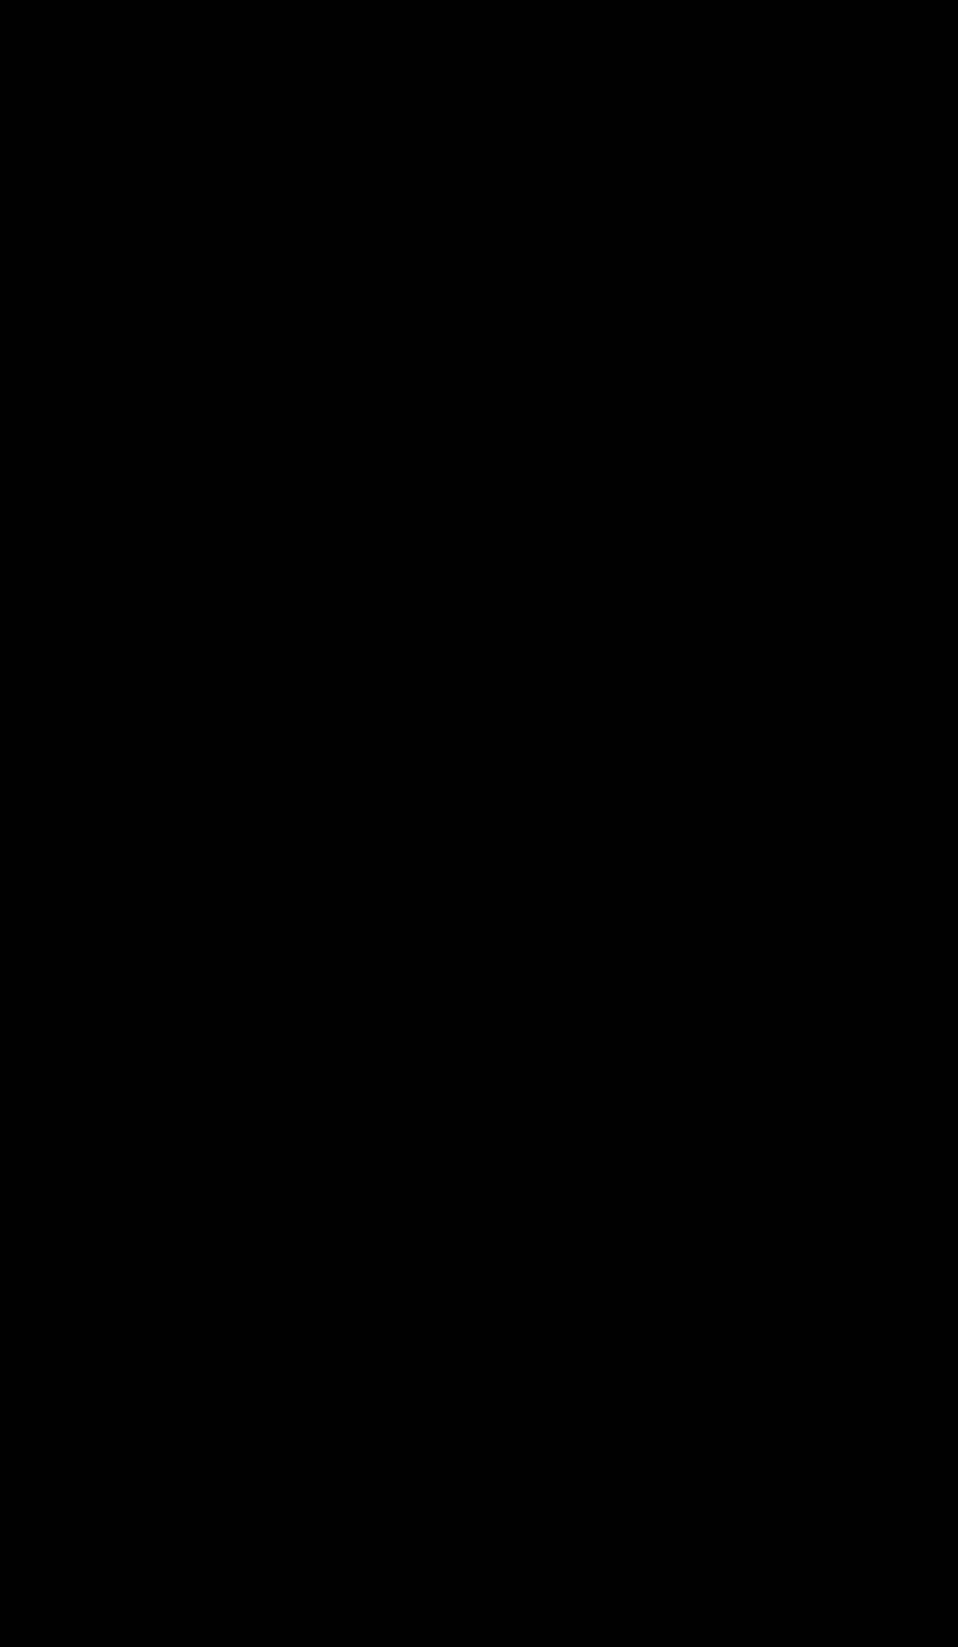 Hand Congress symbol